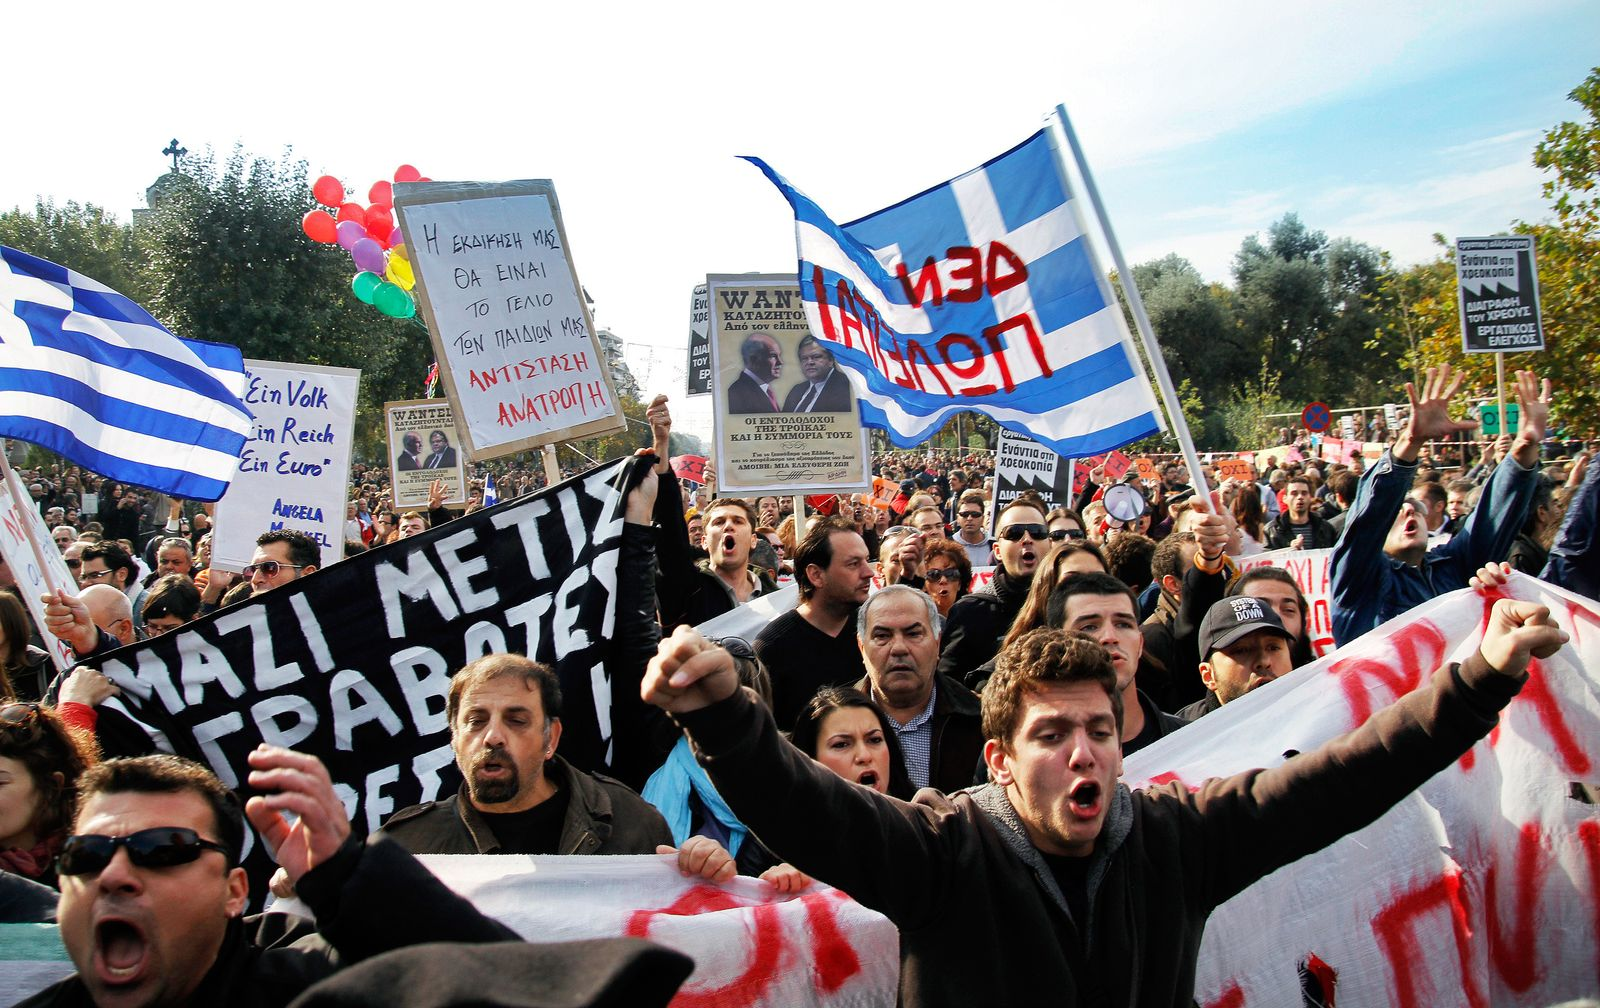 Griechenland / Finanzkrise / Protest